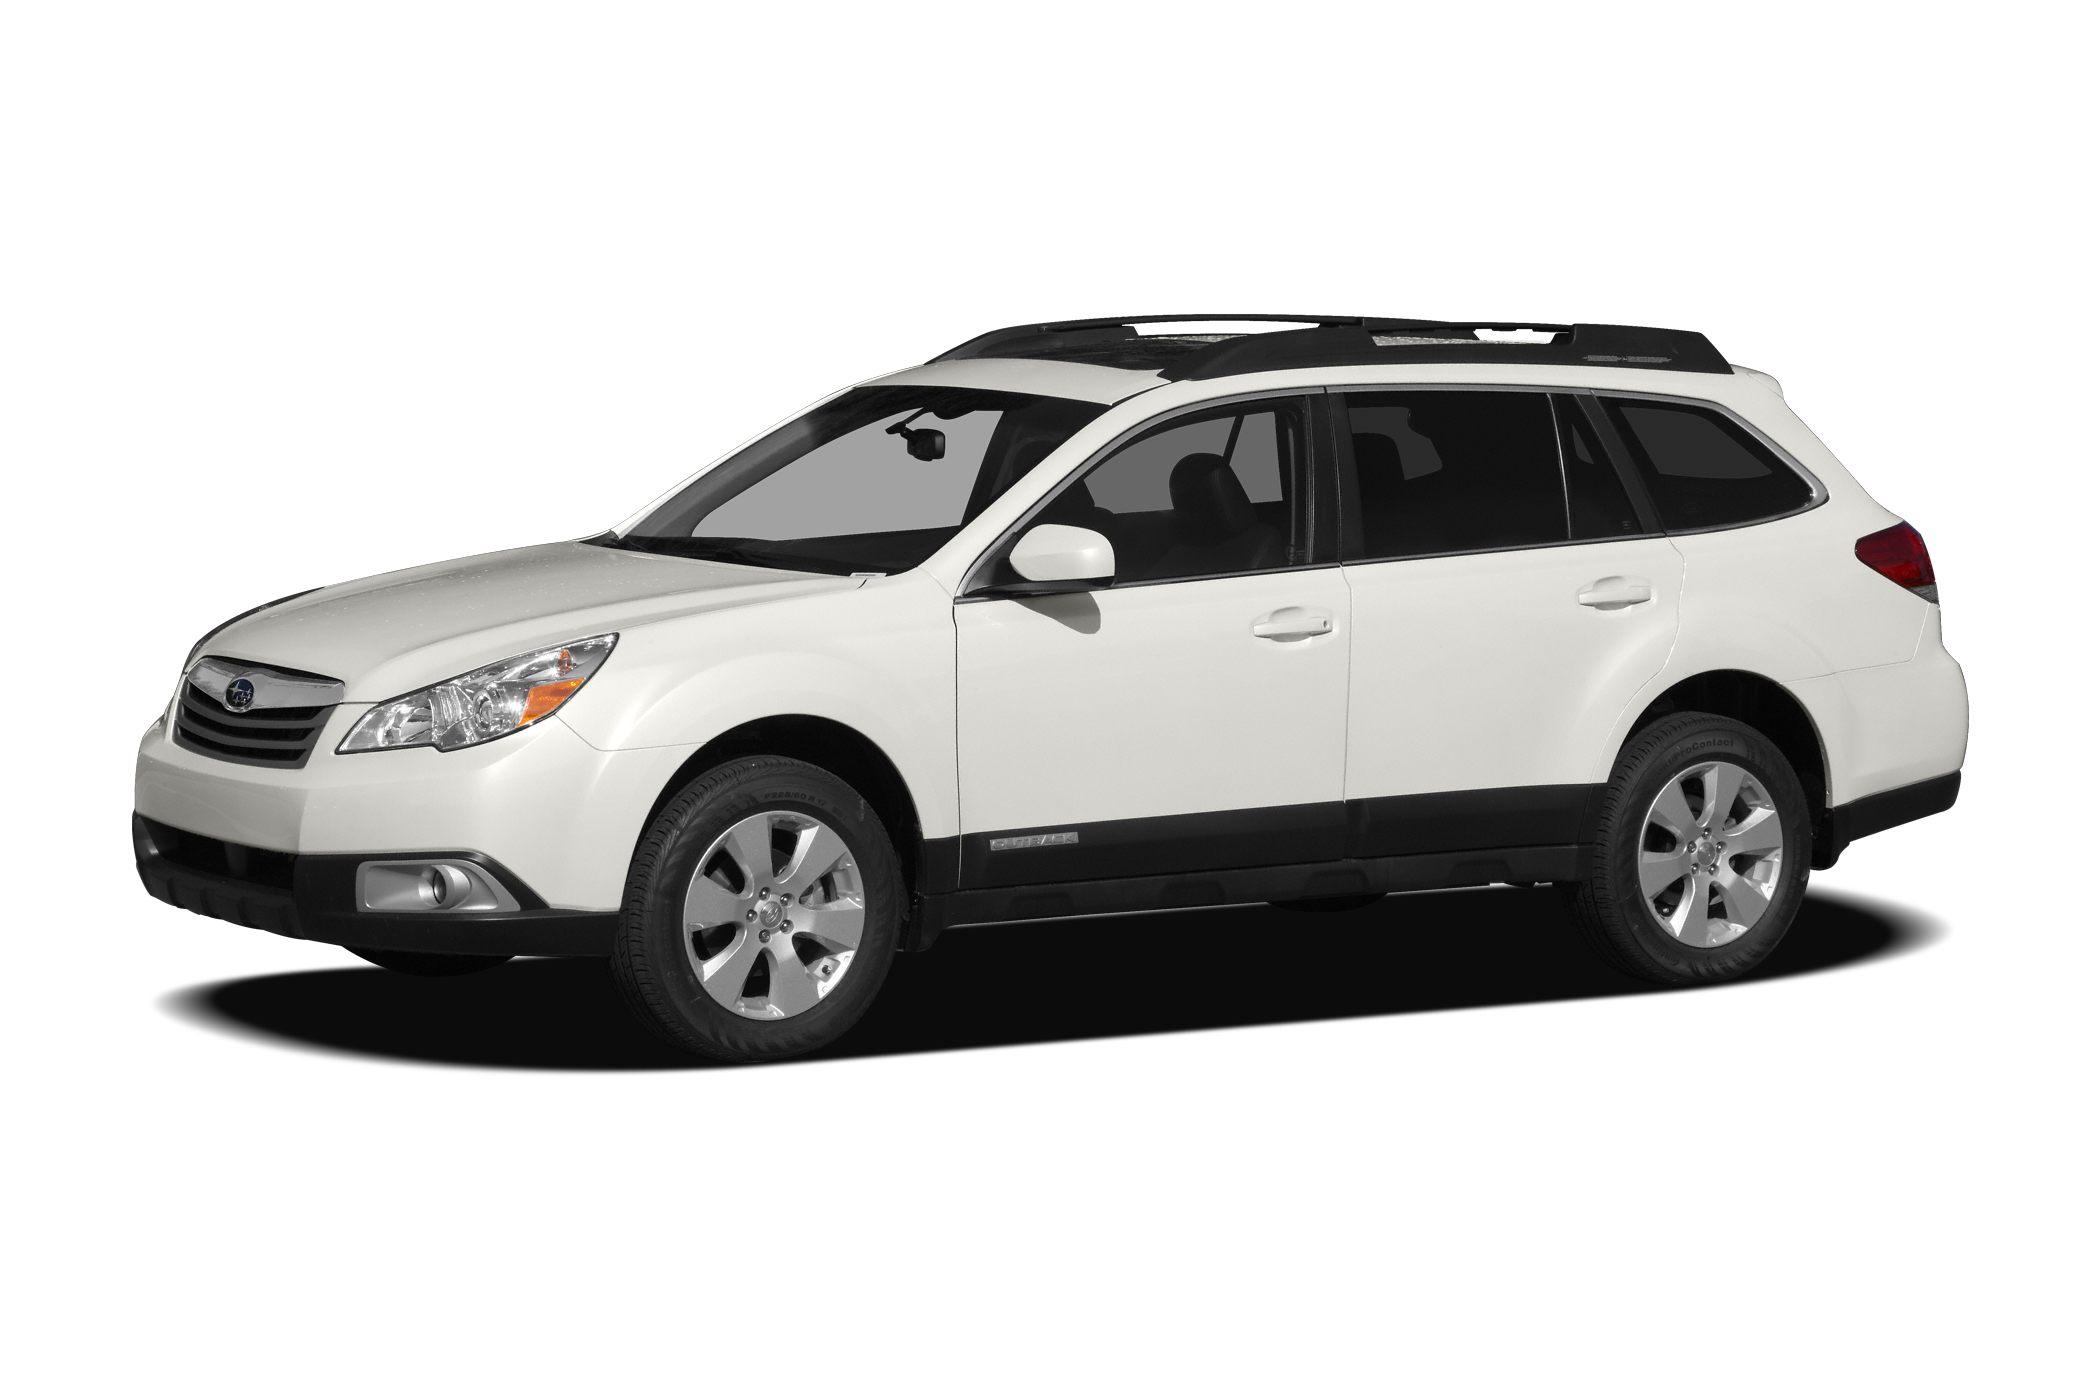 2011 Subaru Outback New Car Test Drive